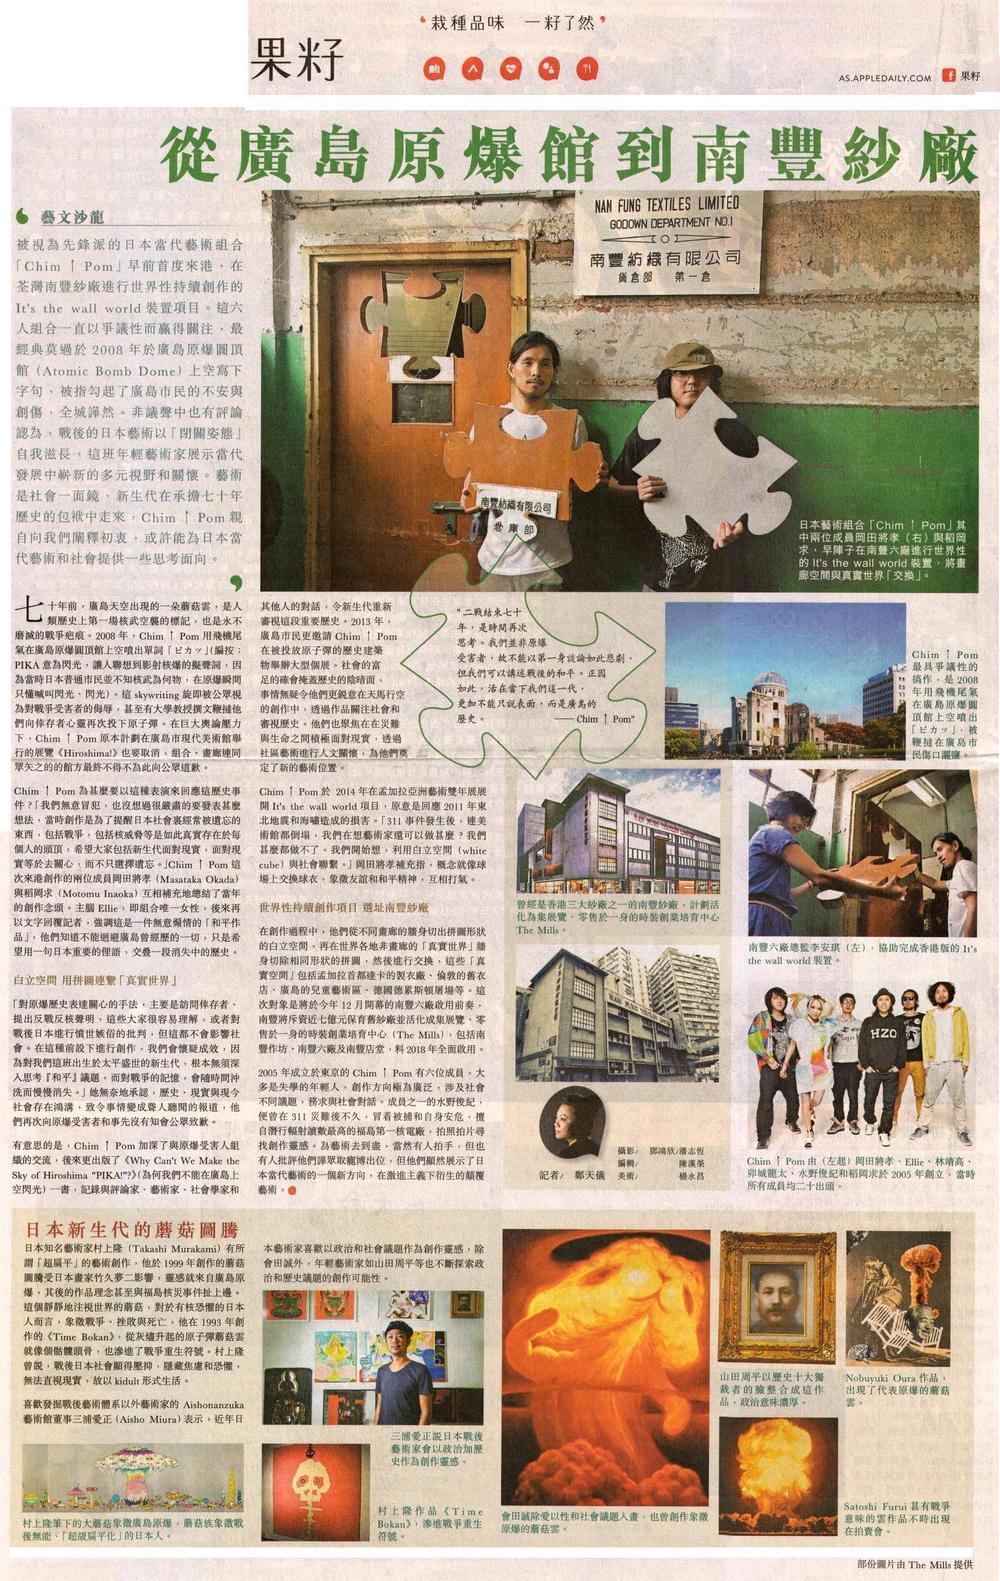 The Mills_3 Sep_Apple Daily (p.E01) .JPG